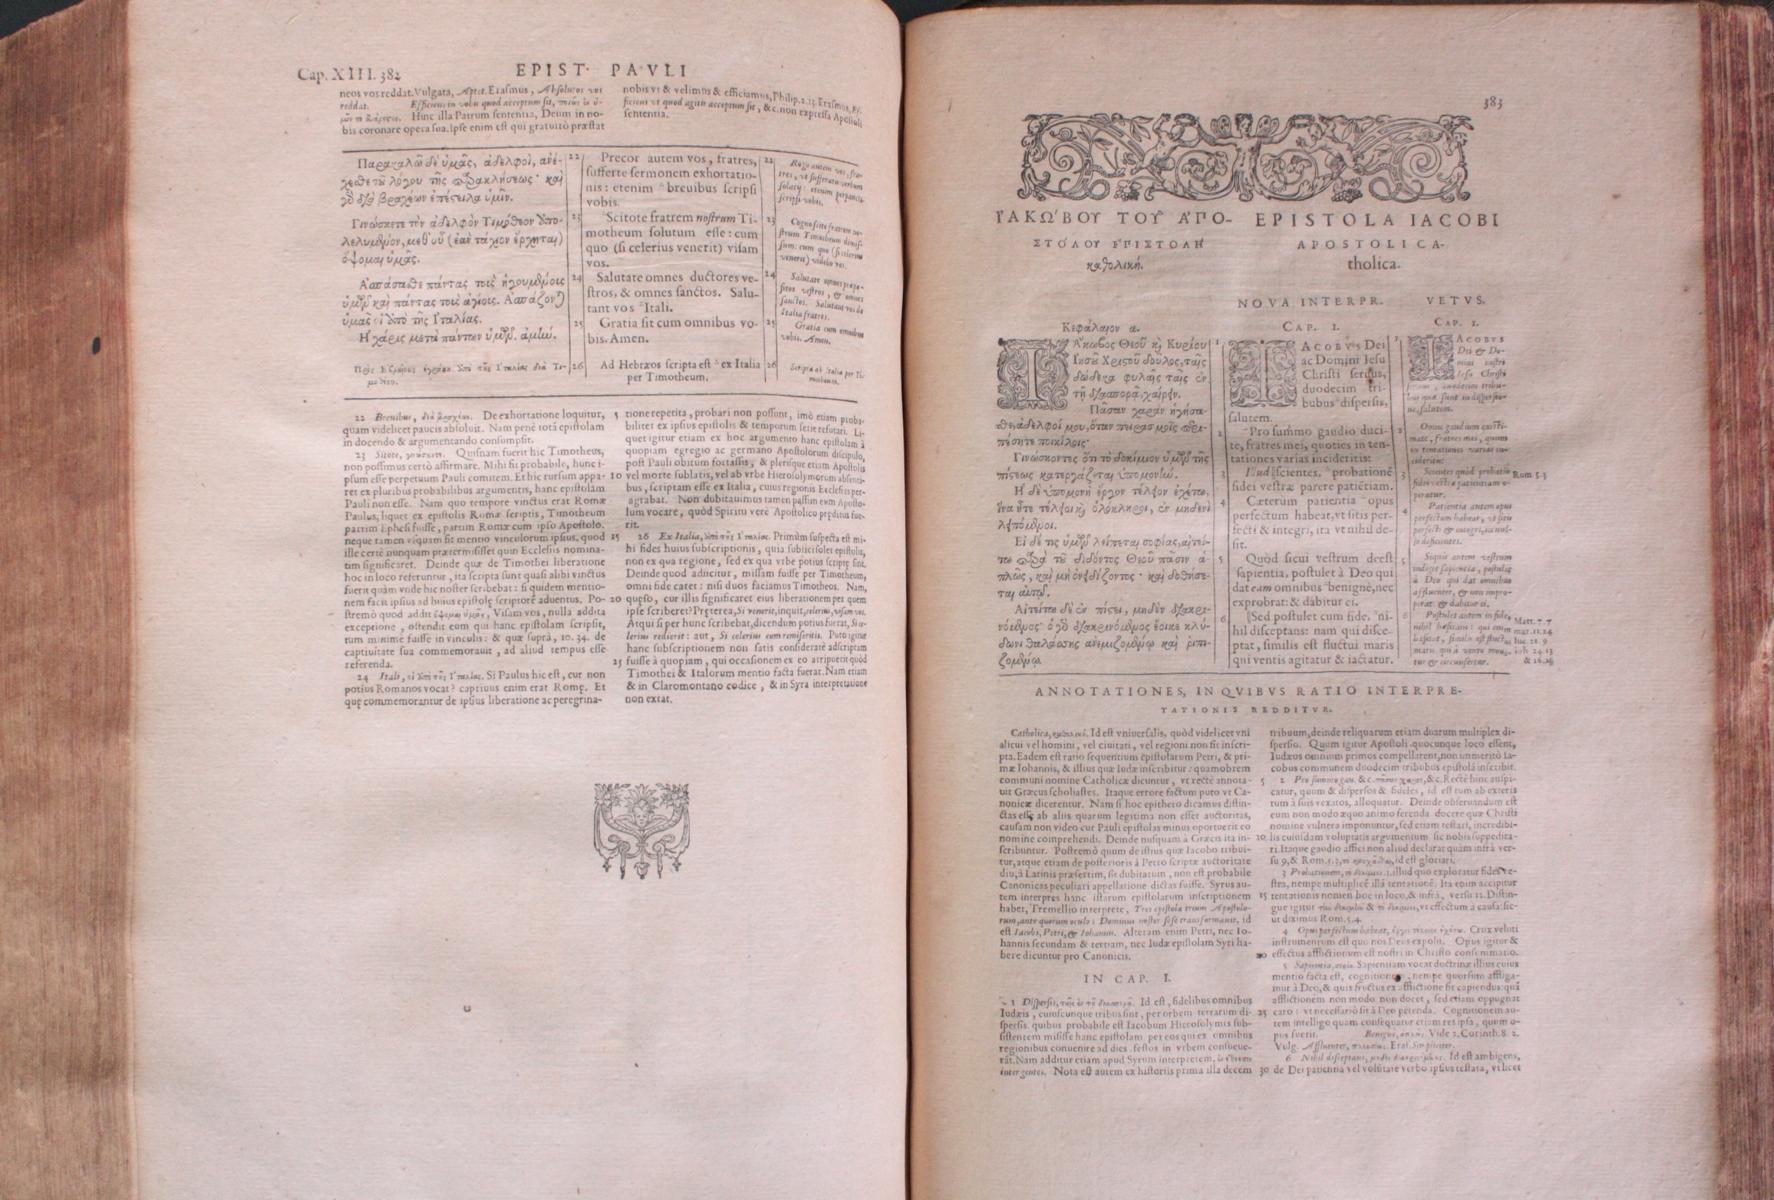 Griechische-Lateinische Bibel, Novum Testamentum 1582-16